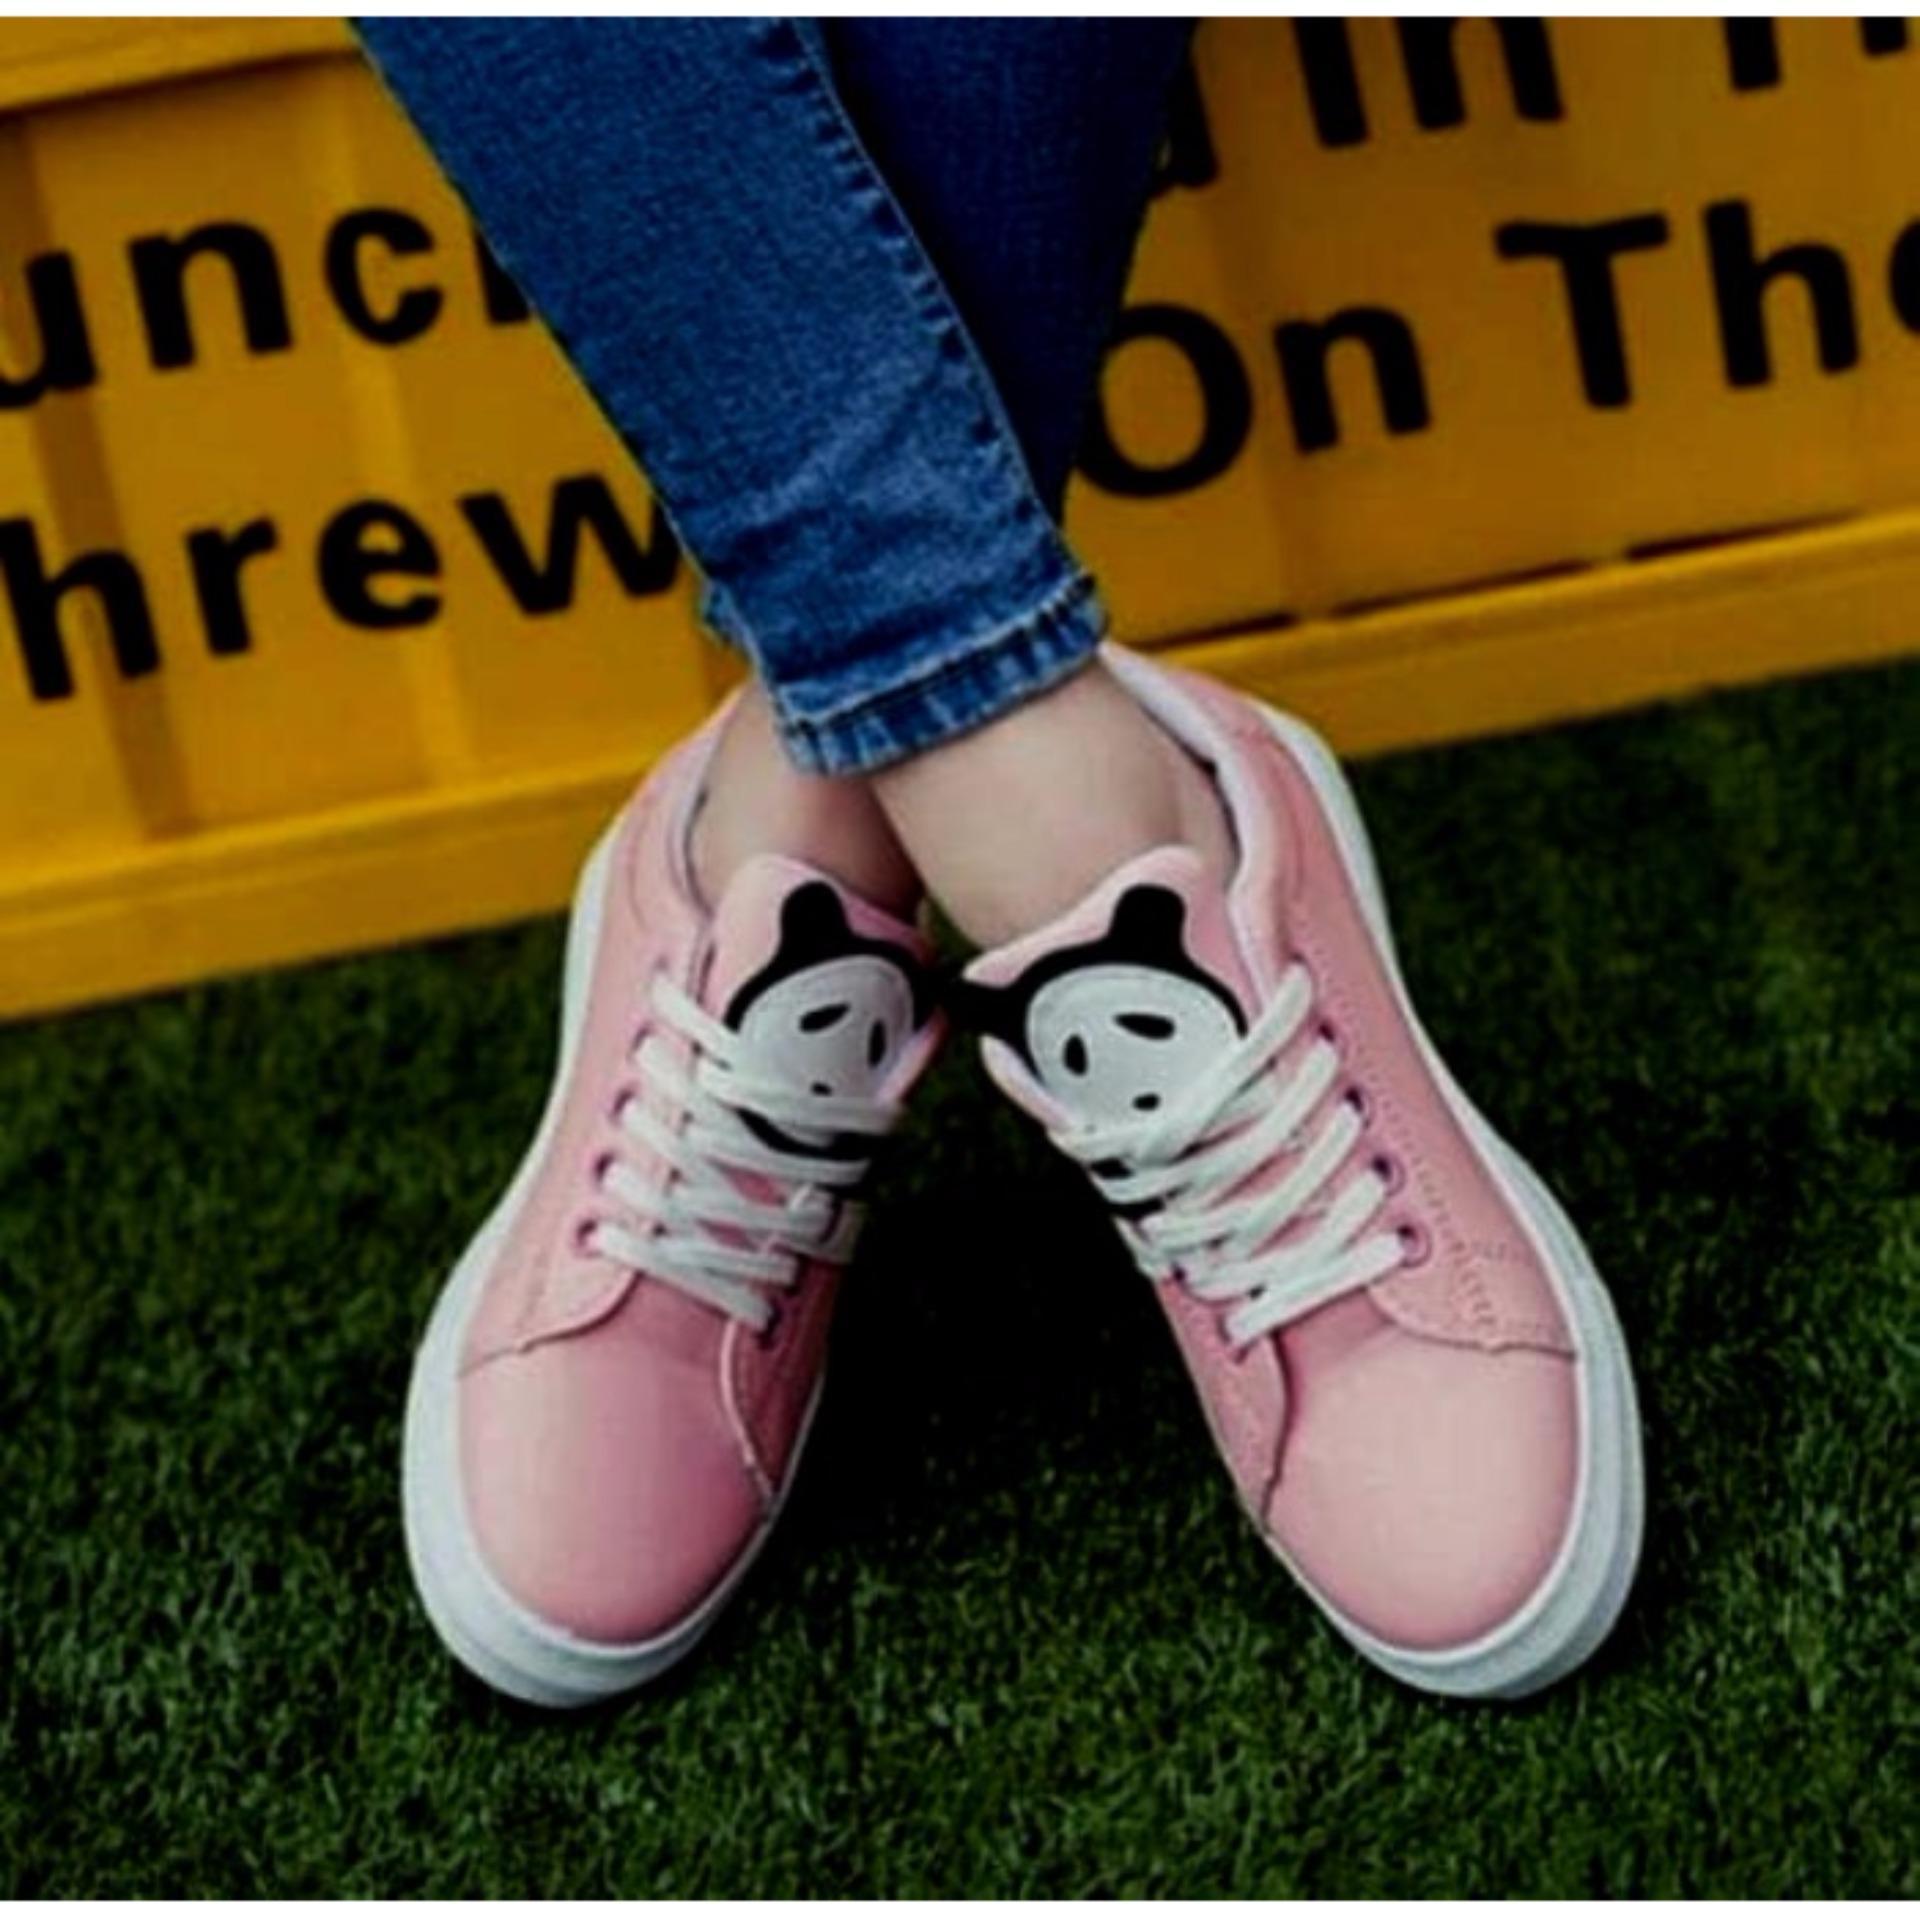 Beli Kets Cewek Casual Kets Panda Mn12 Pink Sepatu Kets Wanita Lucu Murah Hot Sale Fashion Cewek Murah